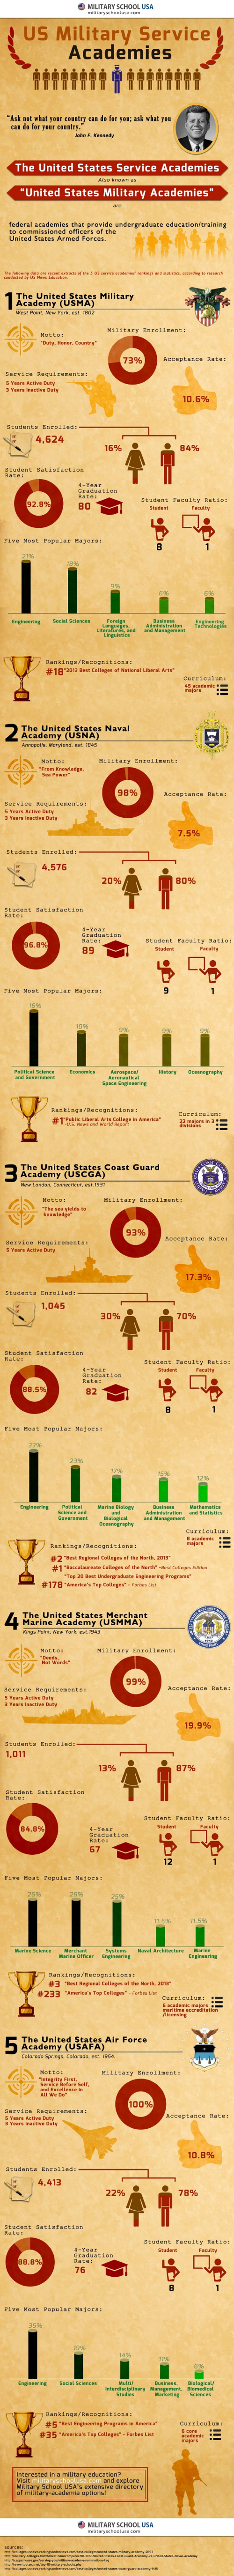 US Military Service Academies'